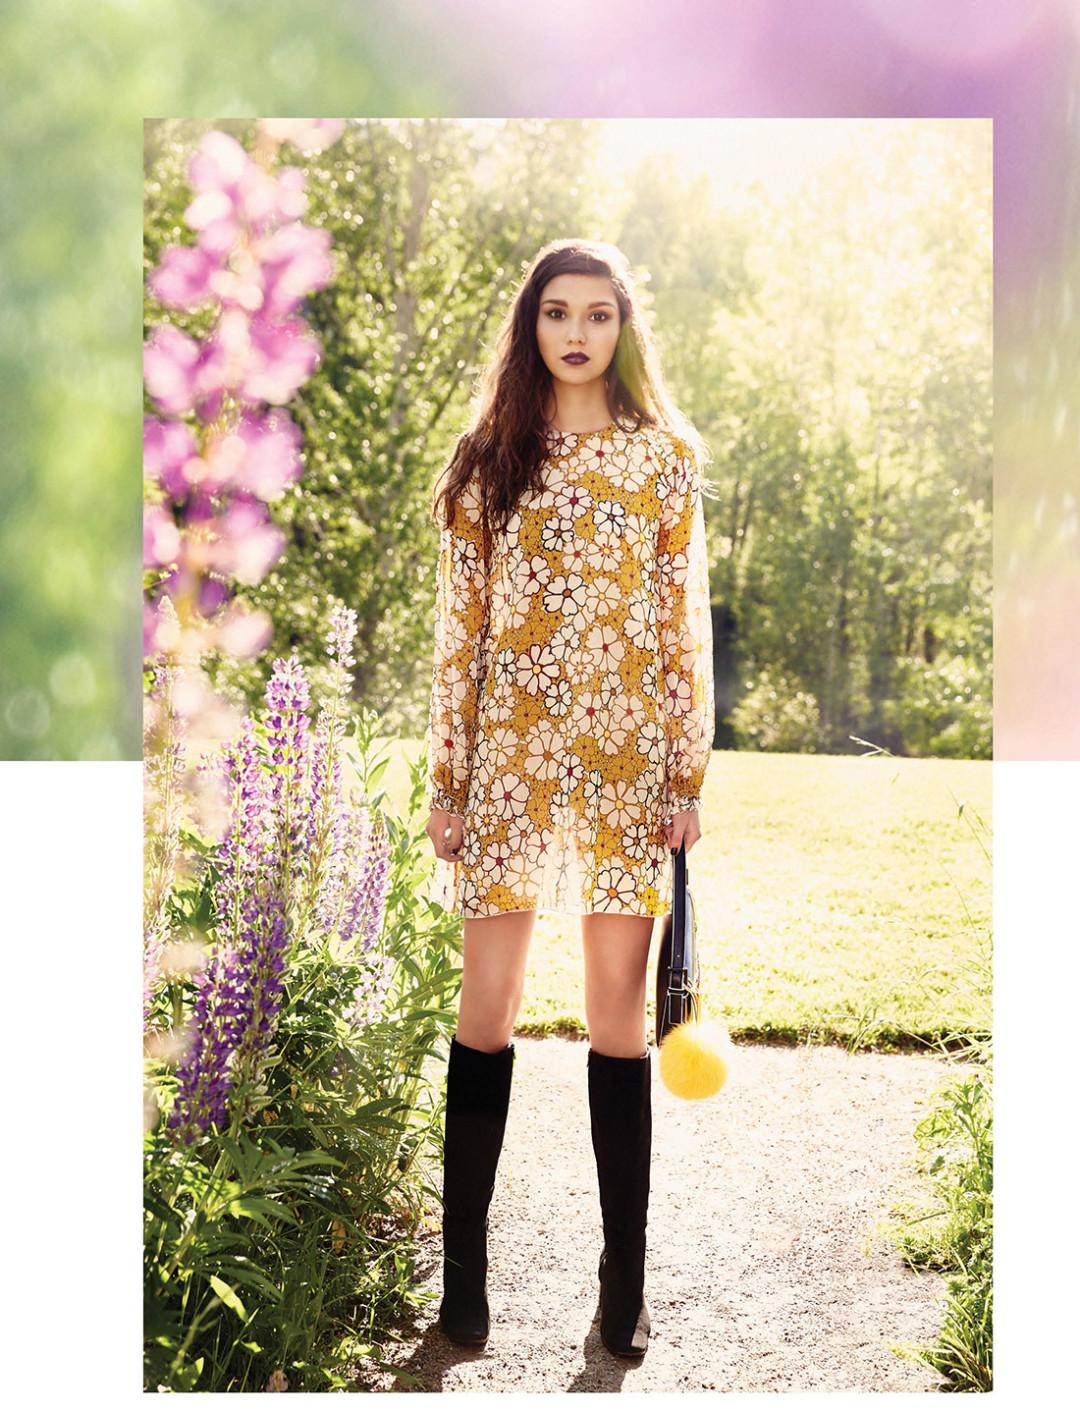 0715 garden glow flower dress euld4j